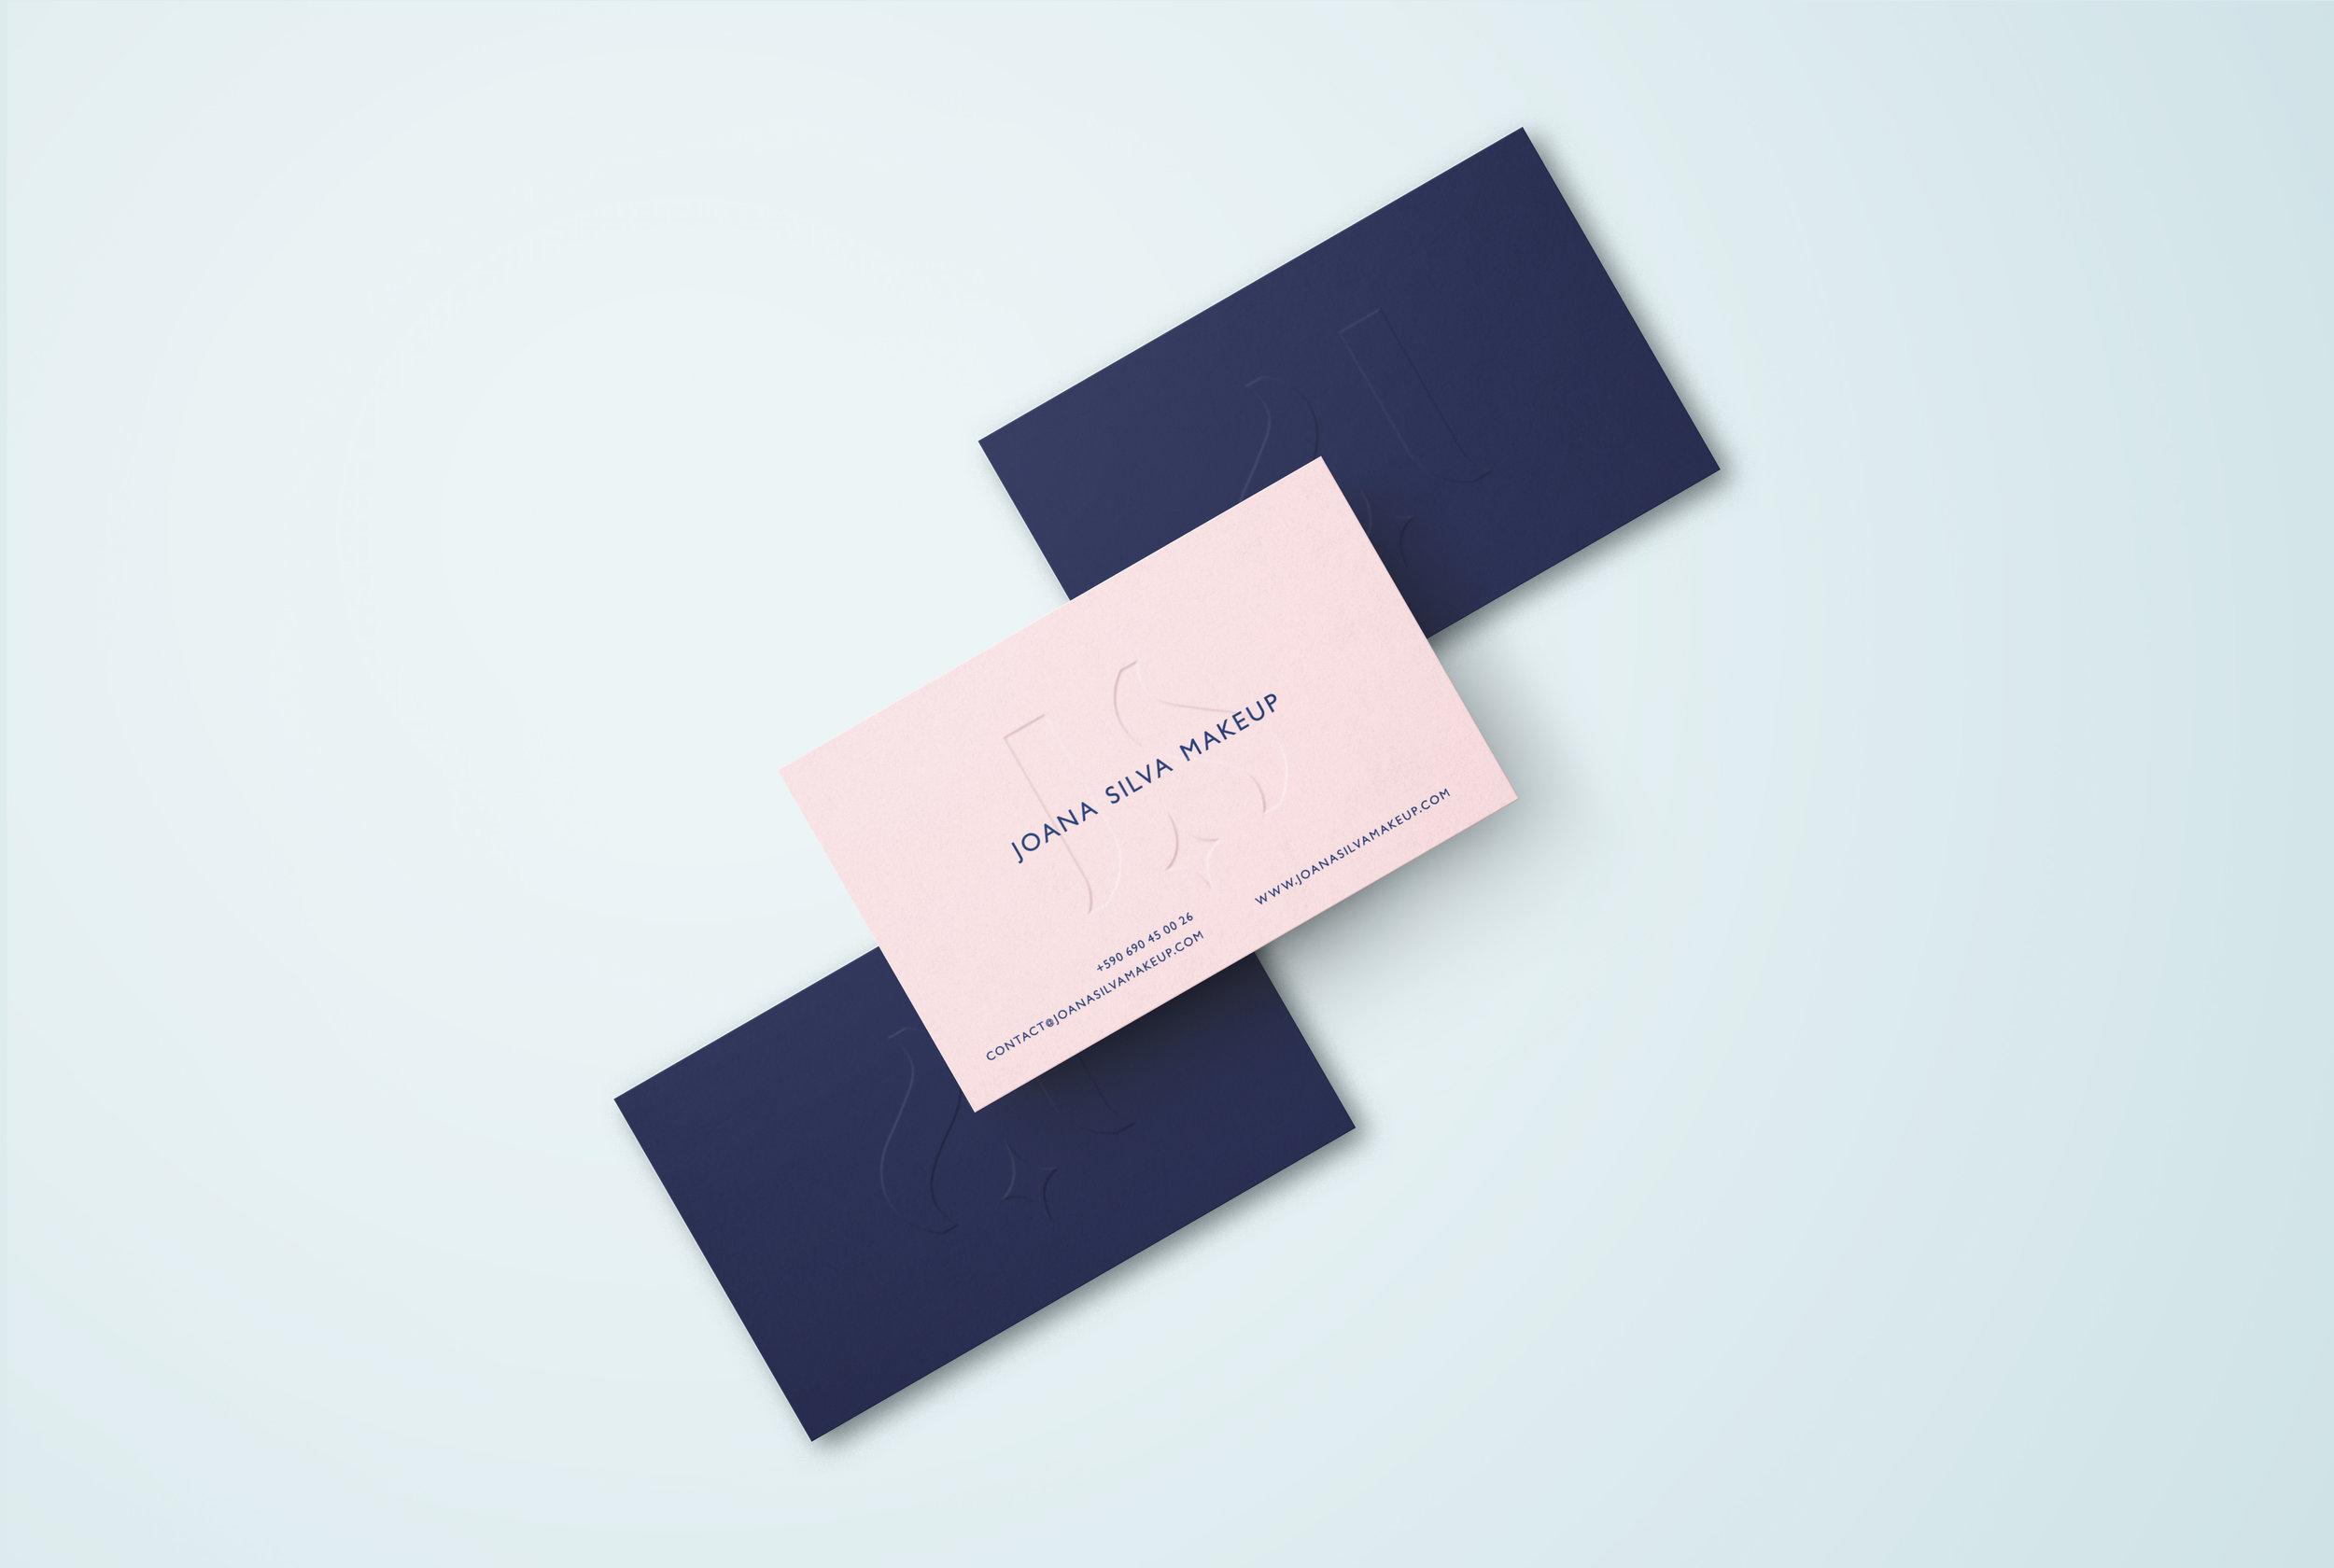 Joana Silva Makeup business cards by Gen Design Studio